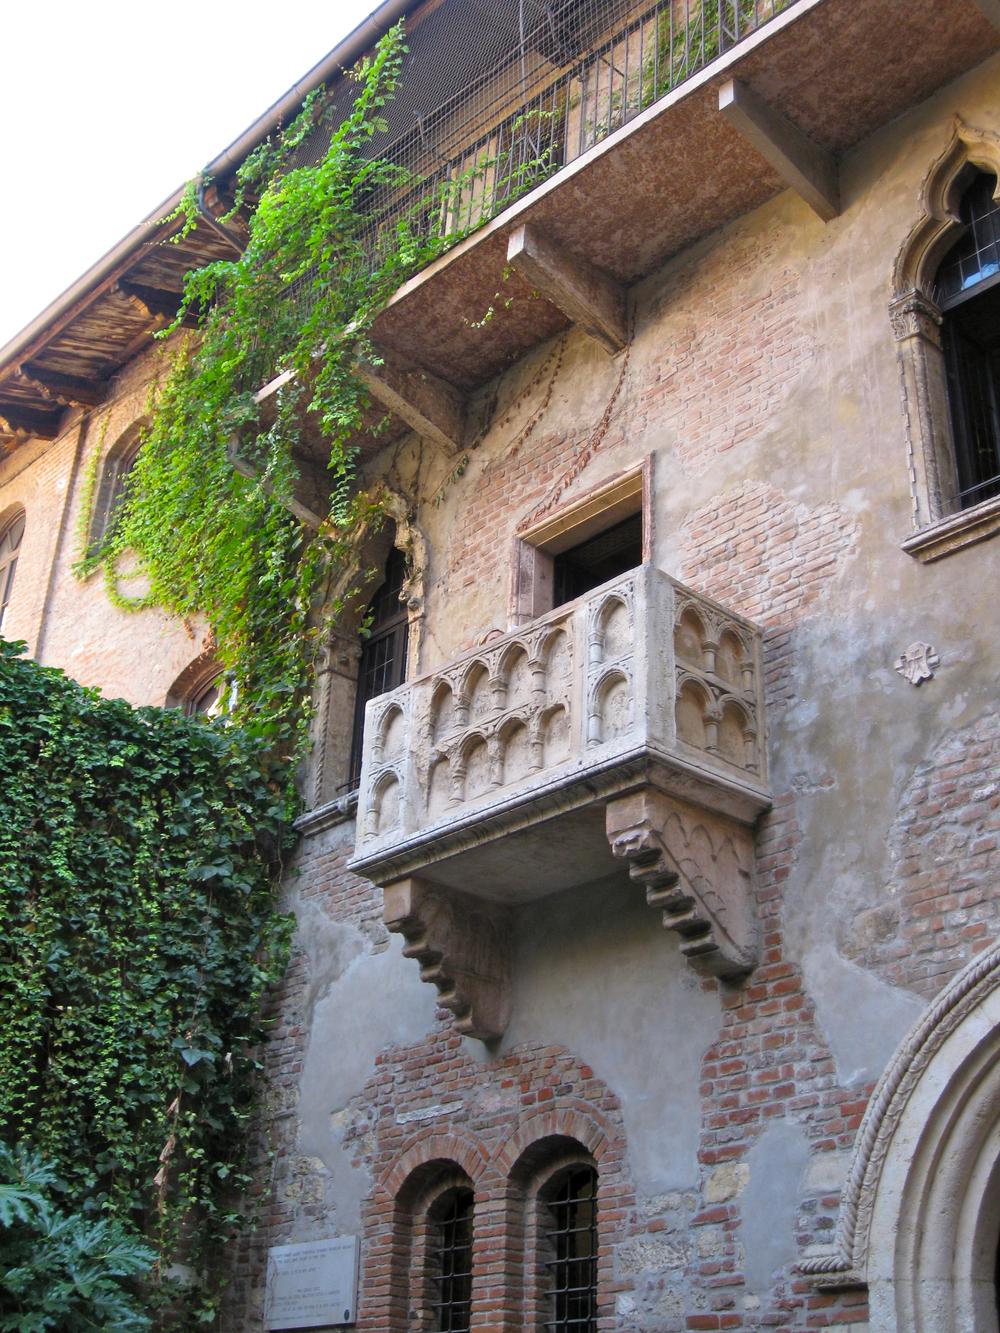 CRO Italy web 2011 - 38.jpg